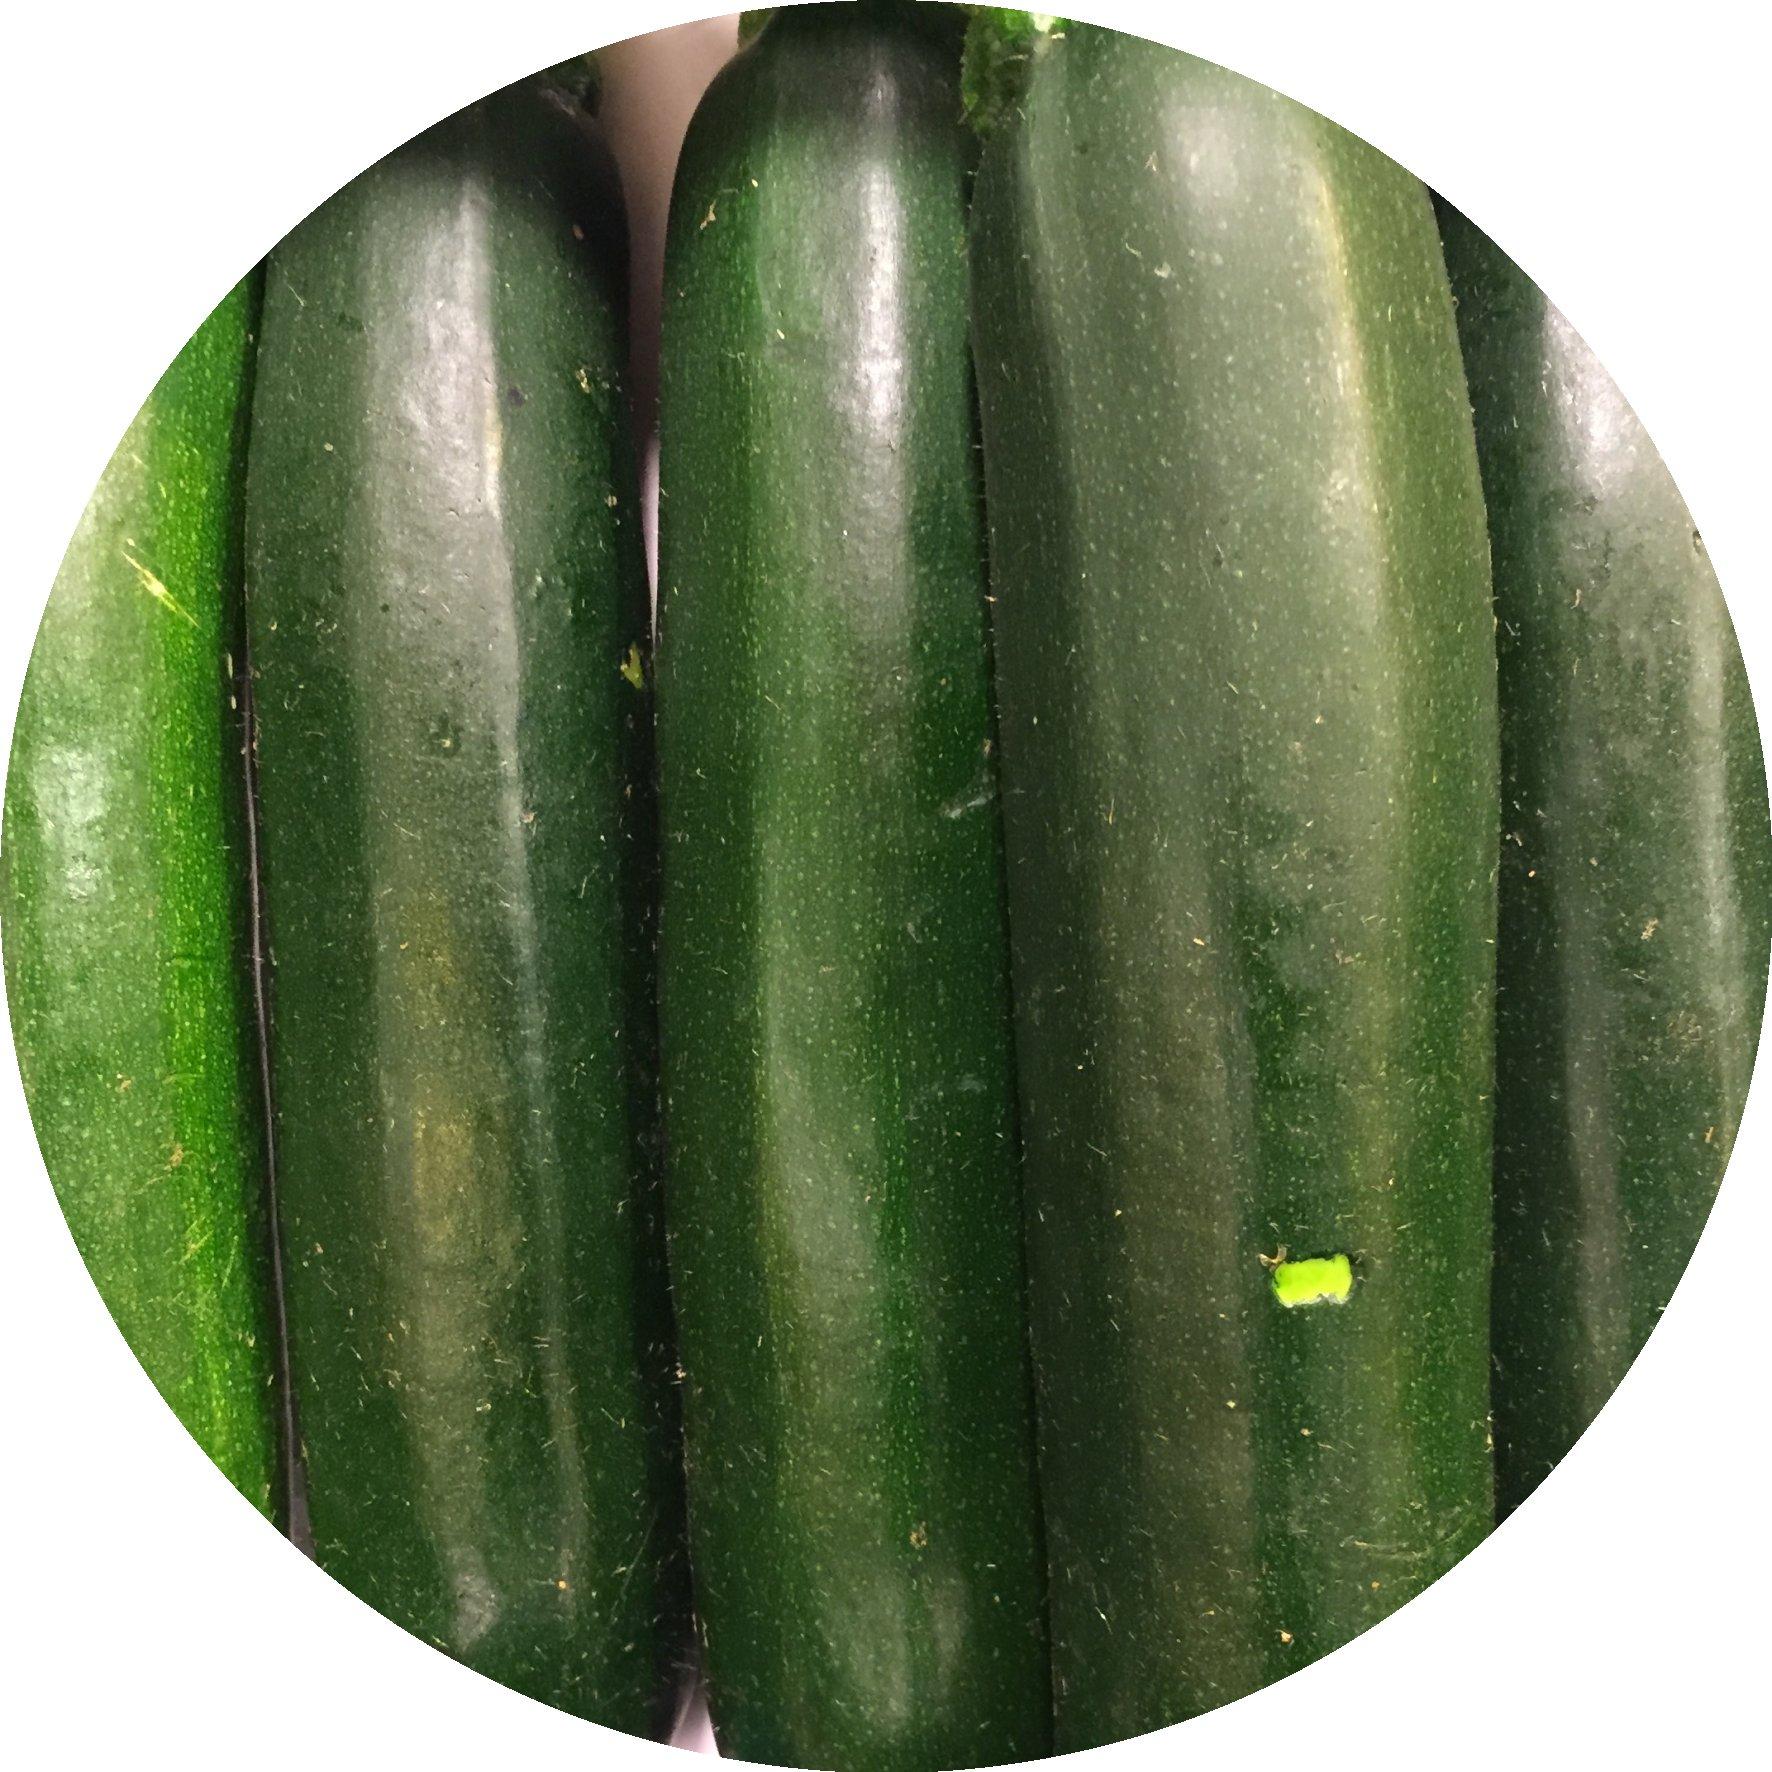 Zucchini_Saisonkalender_Juli